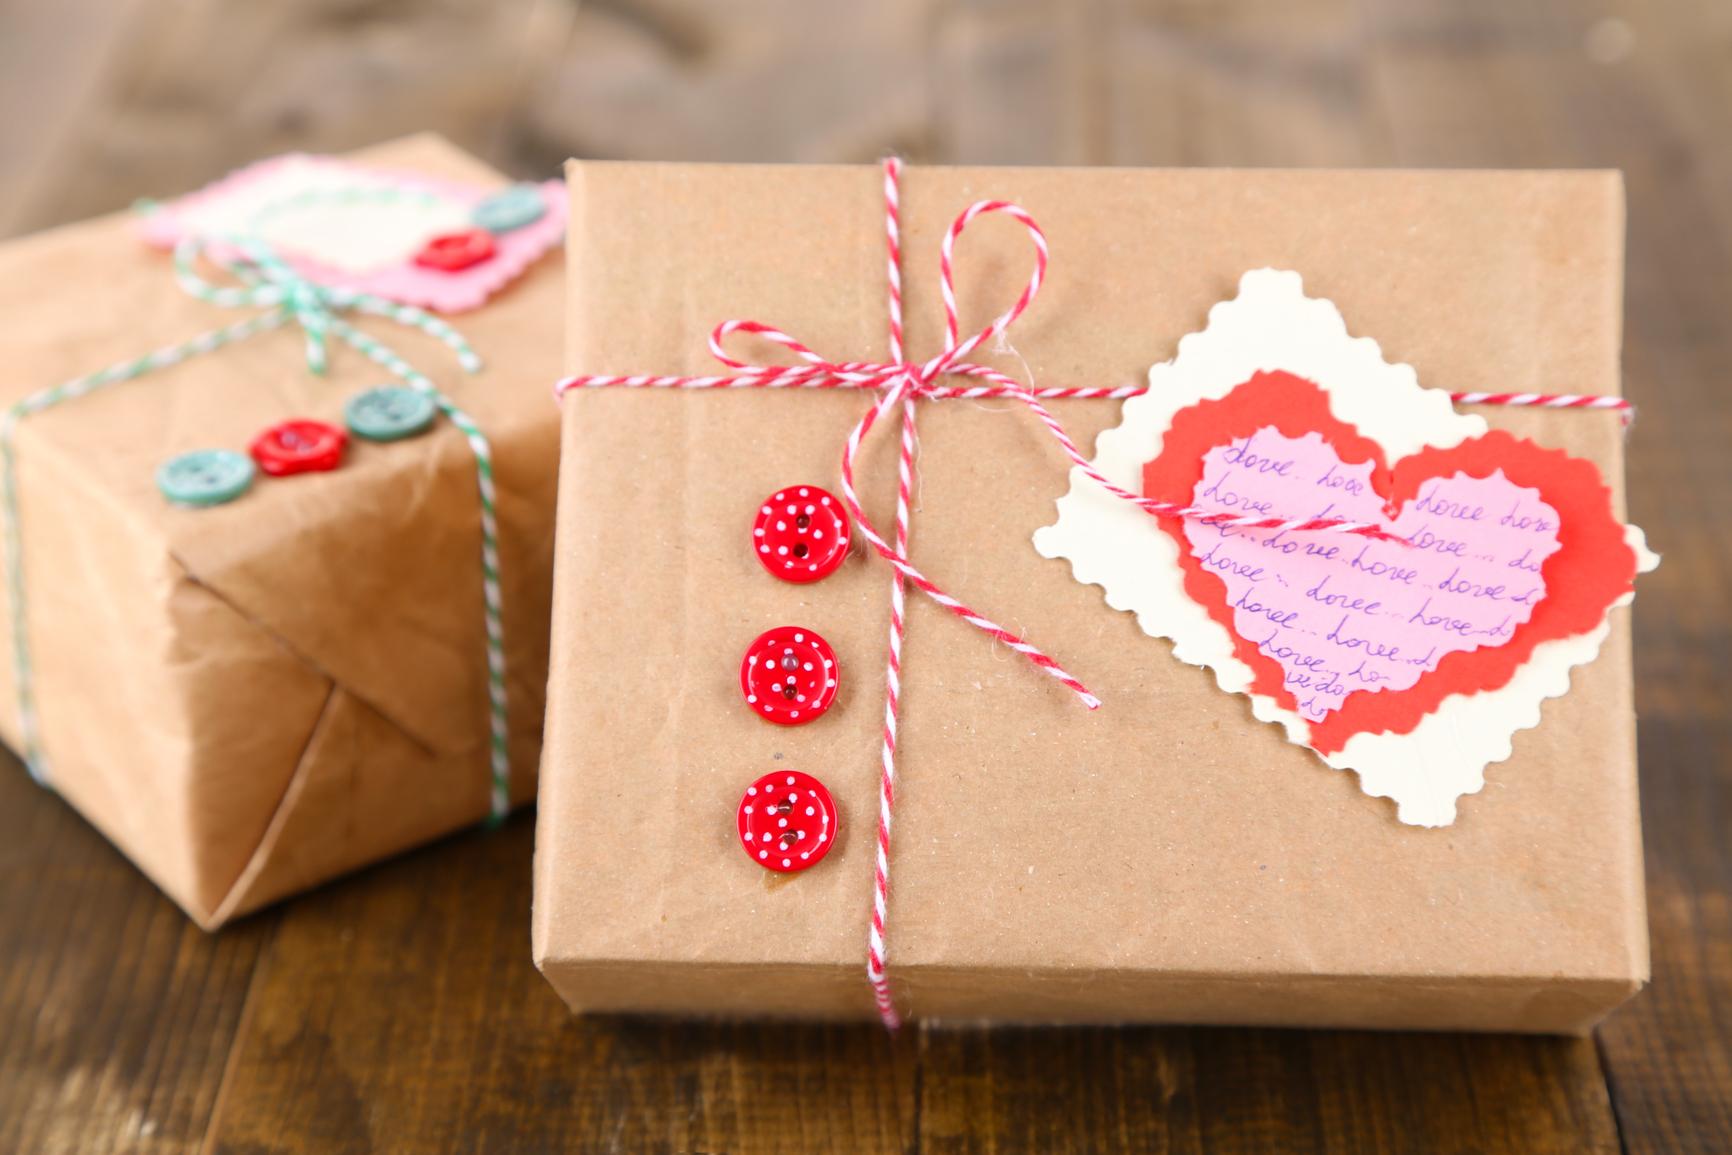 подарки на 15 годовщину знакомства мужу